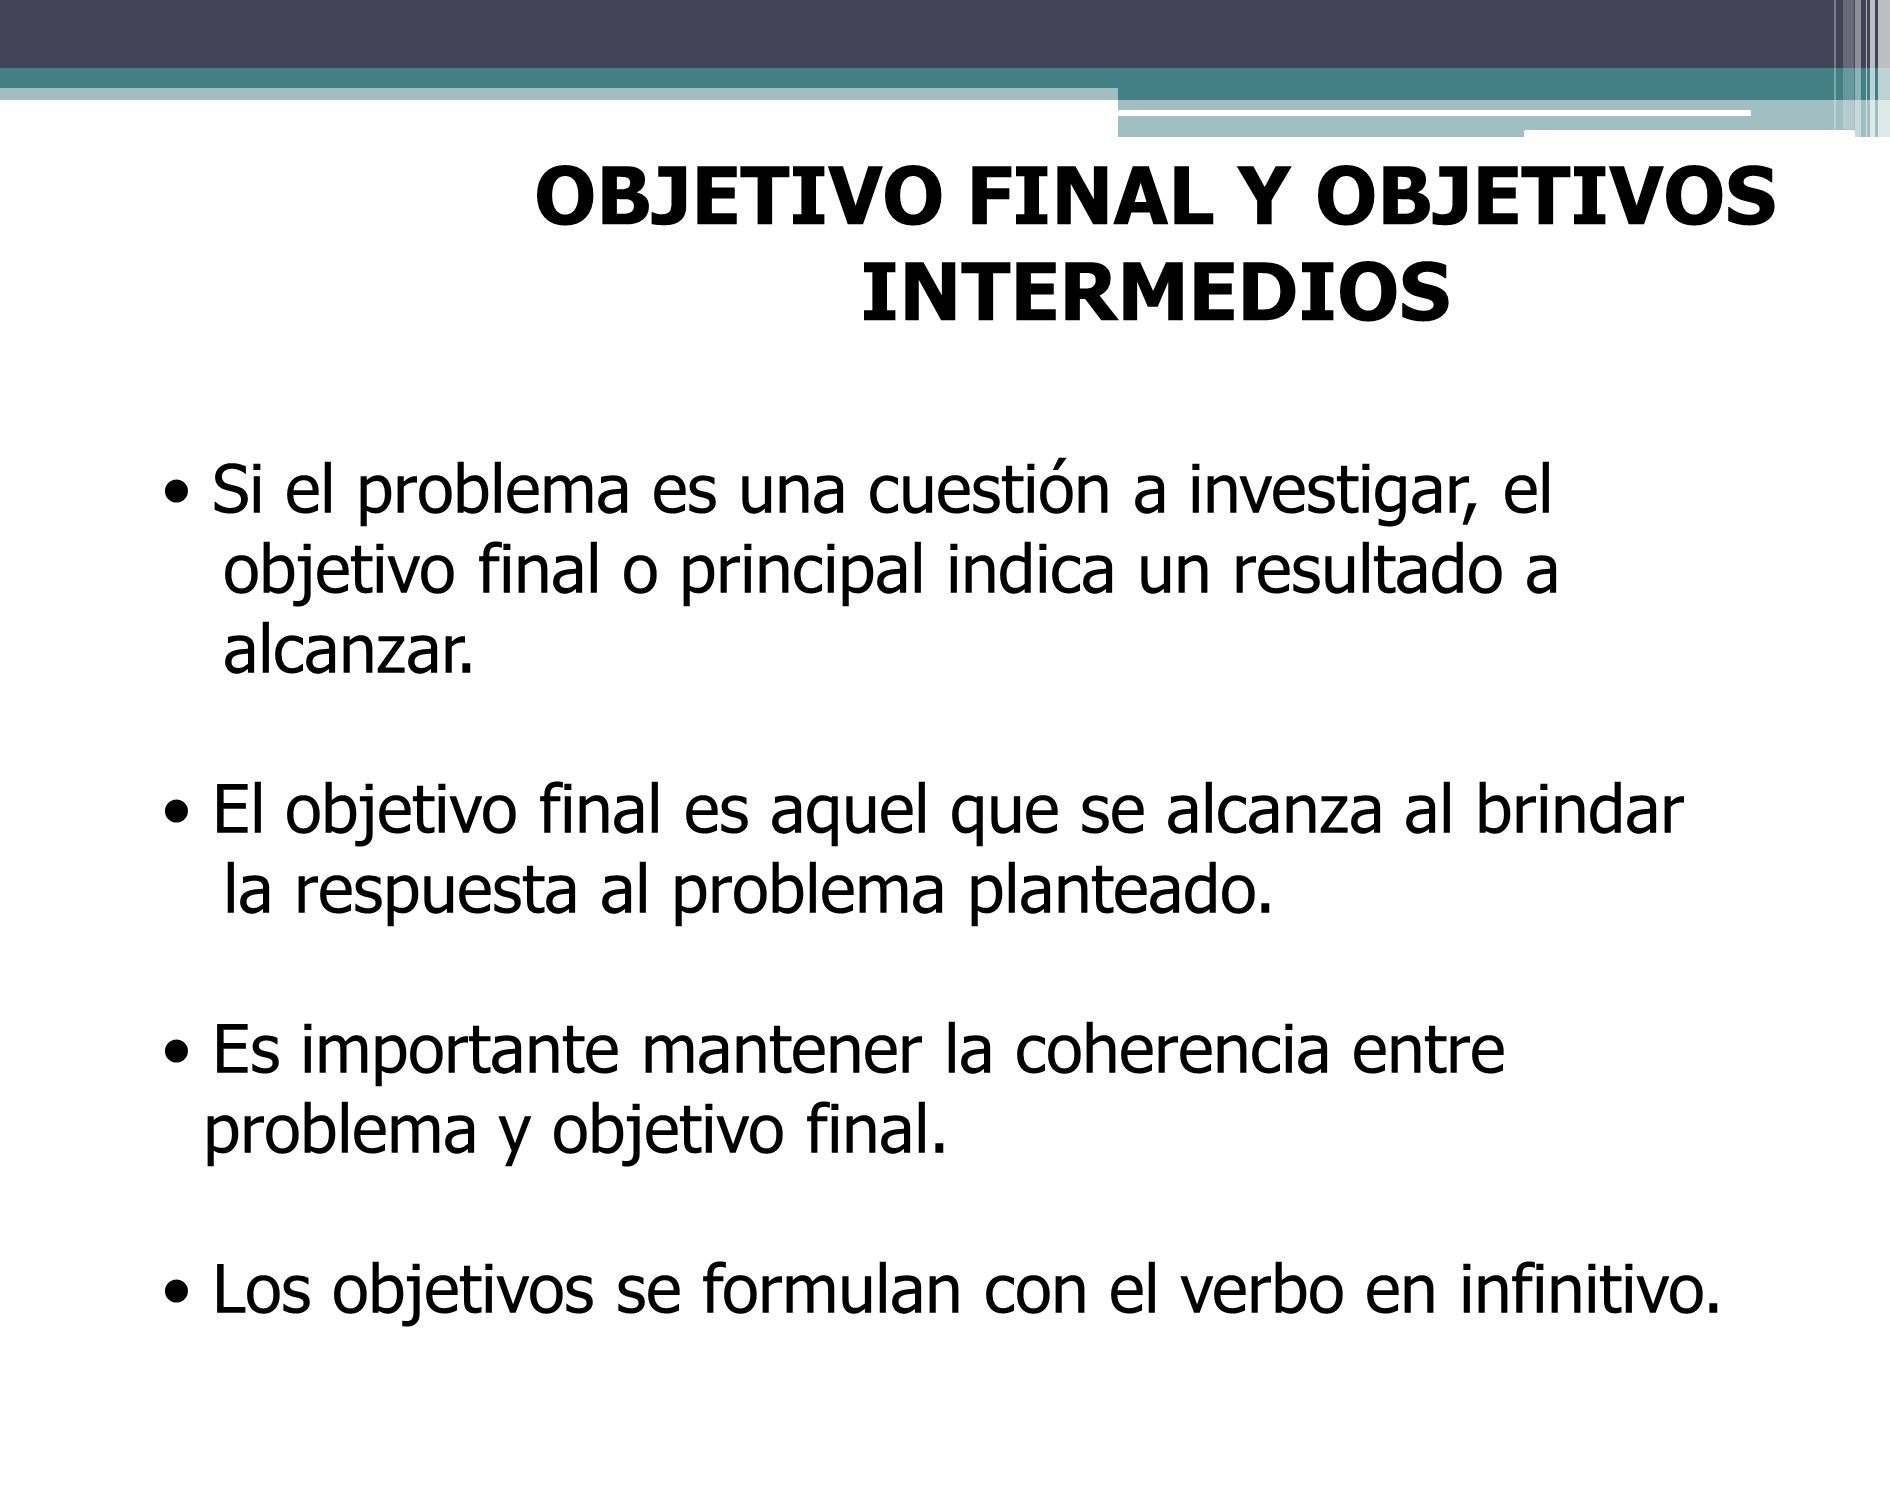 OBJETIVO FINAL Y OBJETIVOS INTERMEDIOS